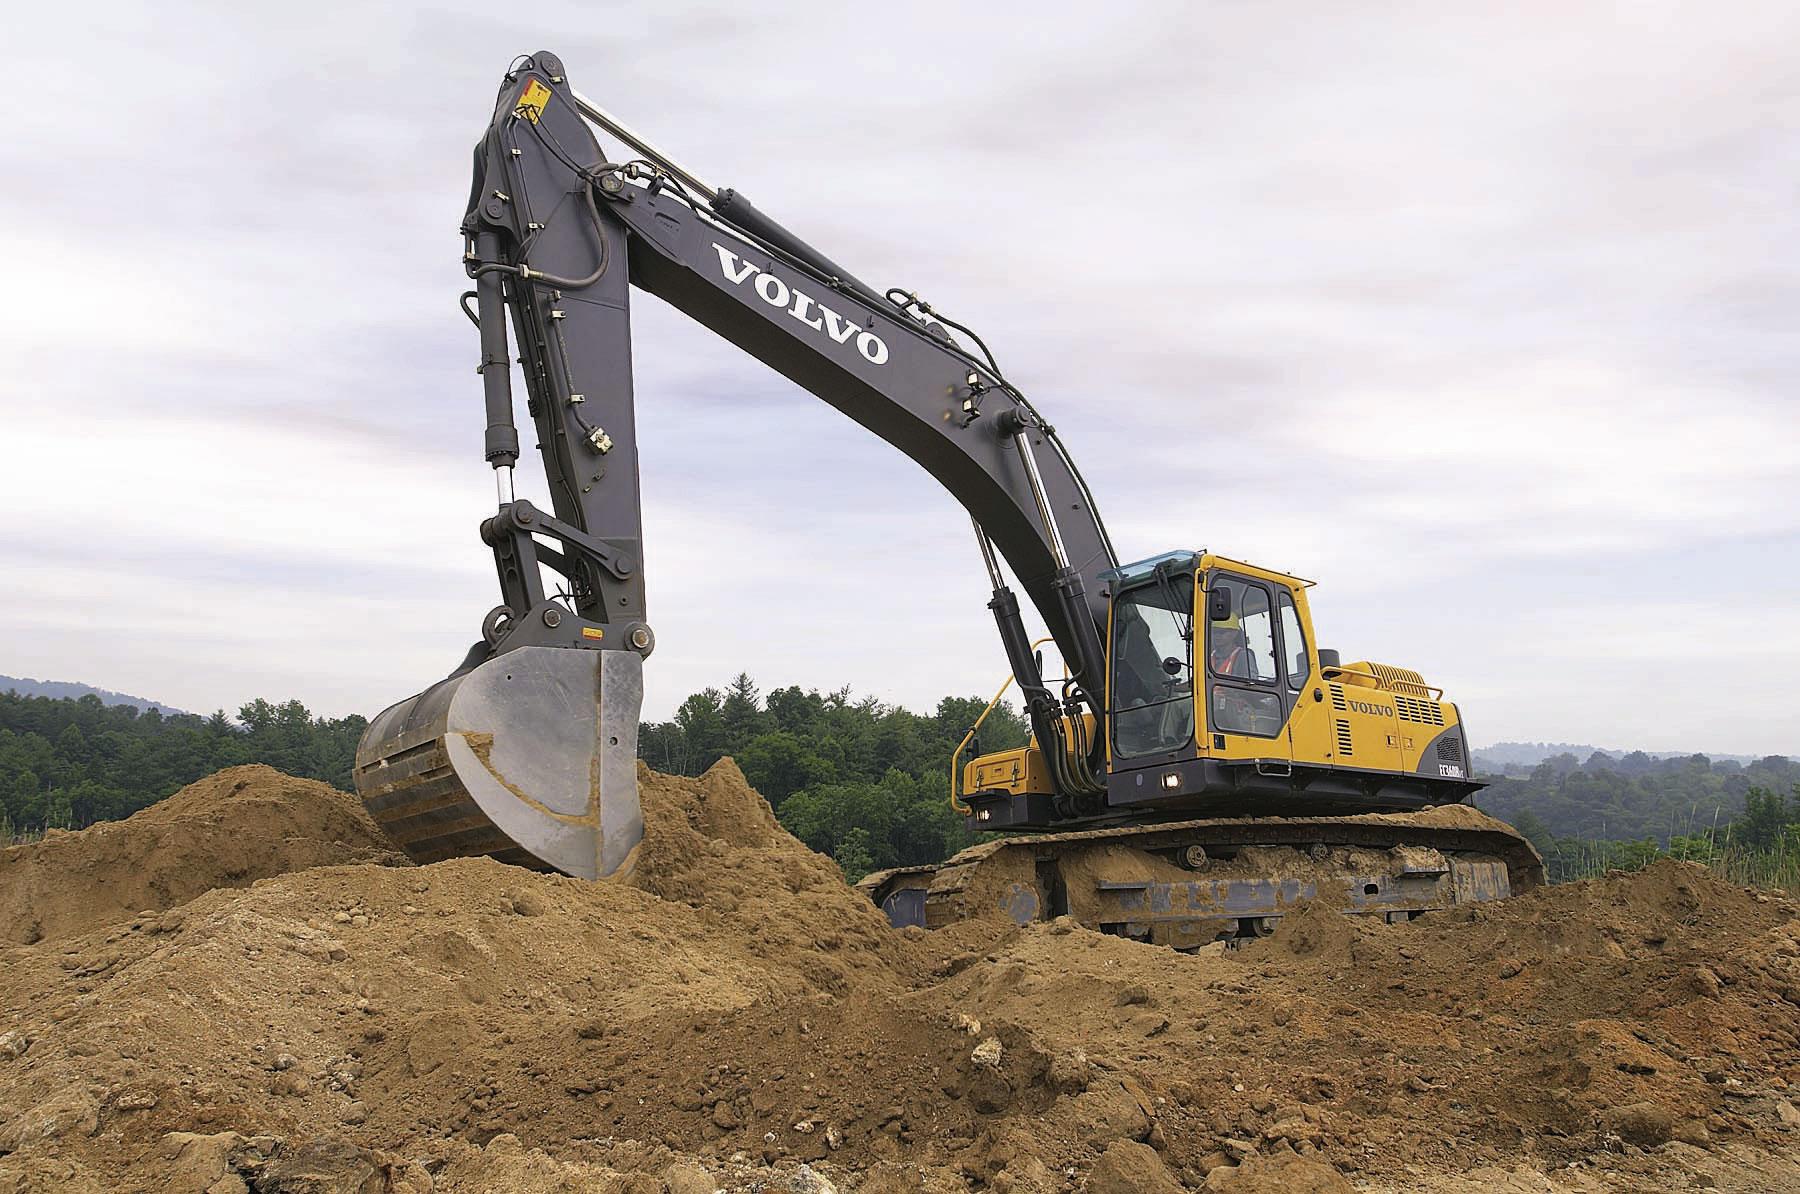 Volvo Excavator Wallpapers Vehicles HQ Volvo Excavator